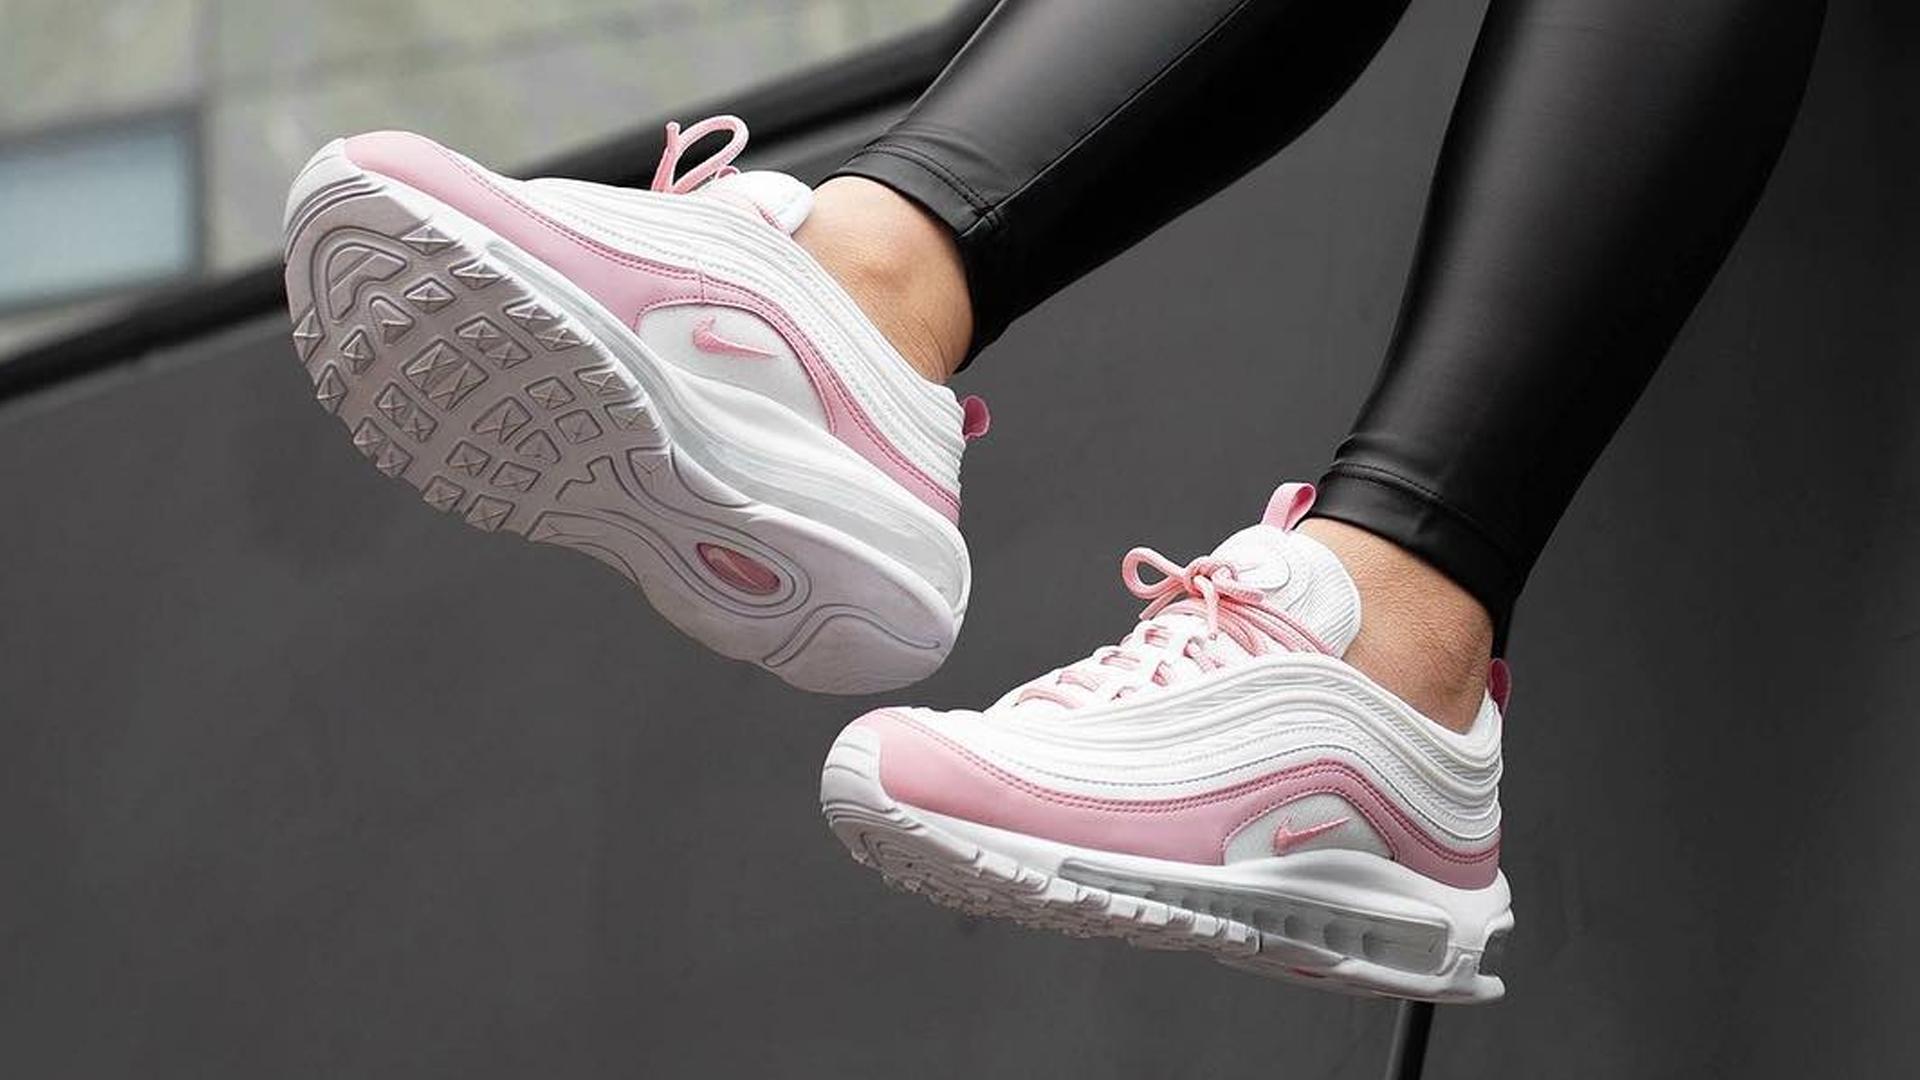 Nike Air Max 97 Pink BV1982